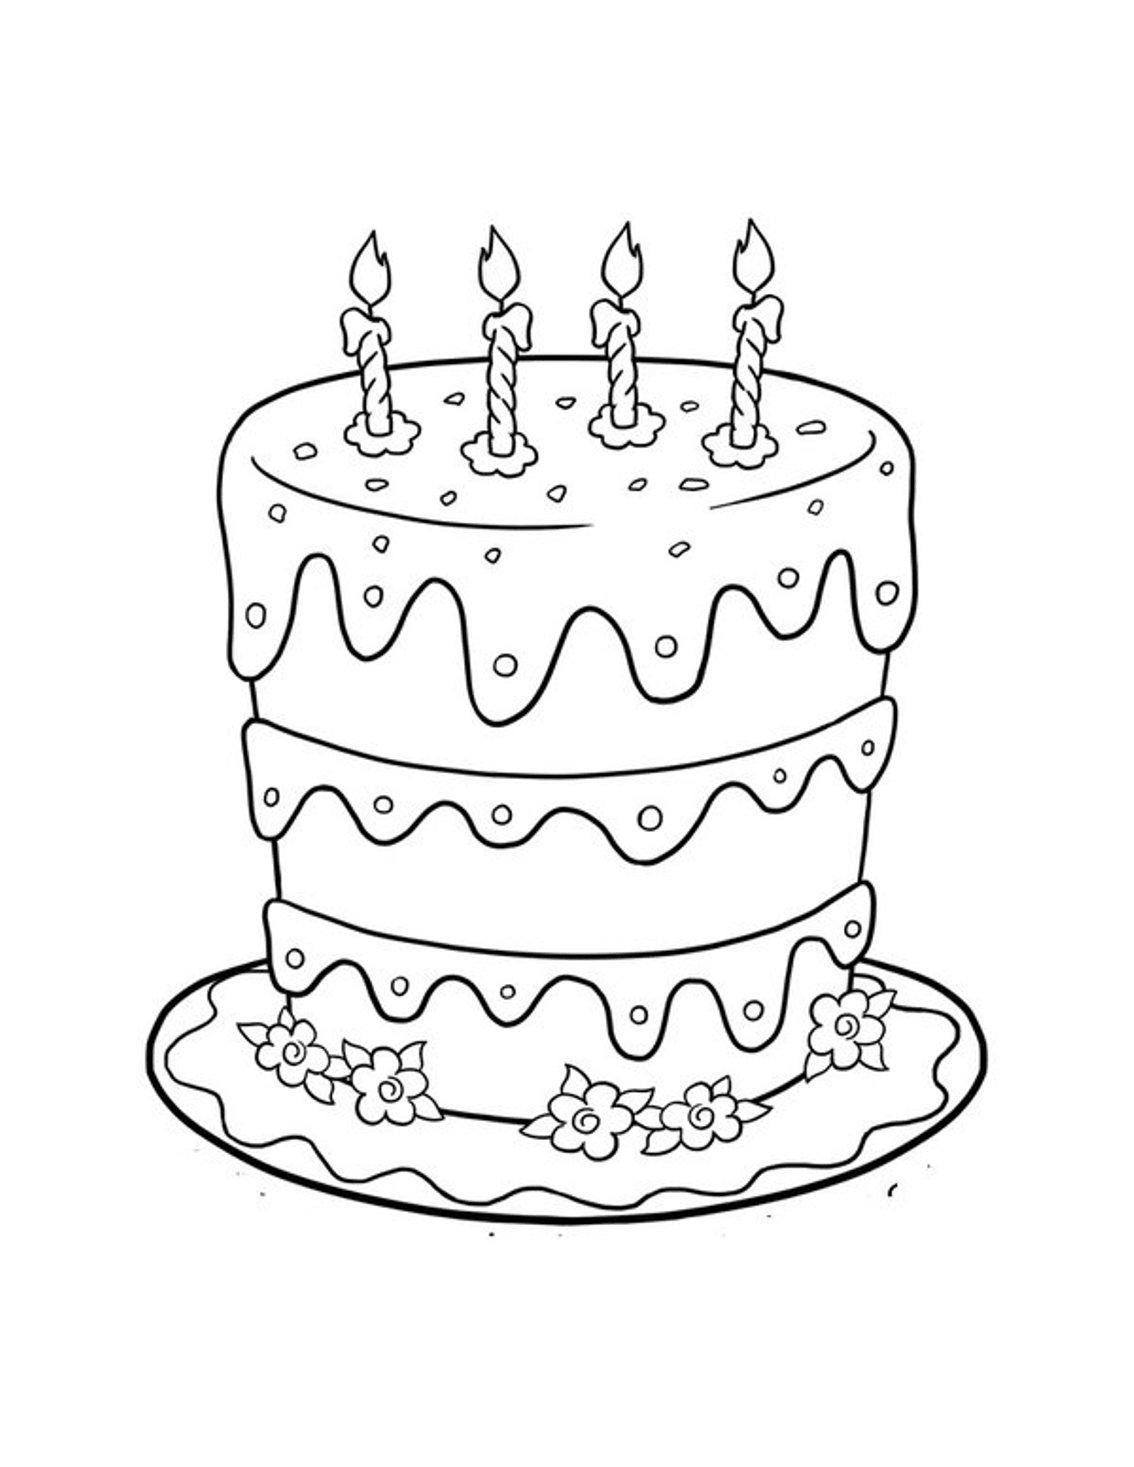 Mewarnai Kue Ulang Tahun : mewarnai, ulang, tahun, Gambar, Mewarnai, Ulang, Tahun, Untuk